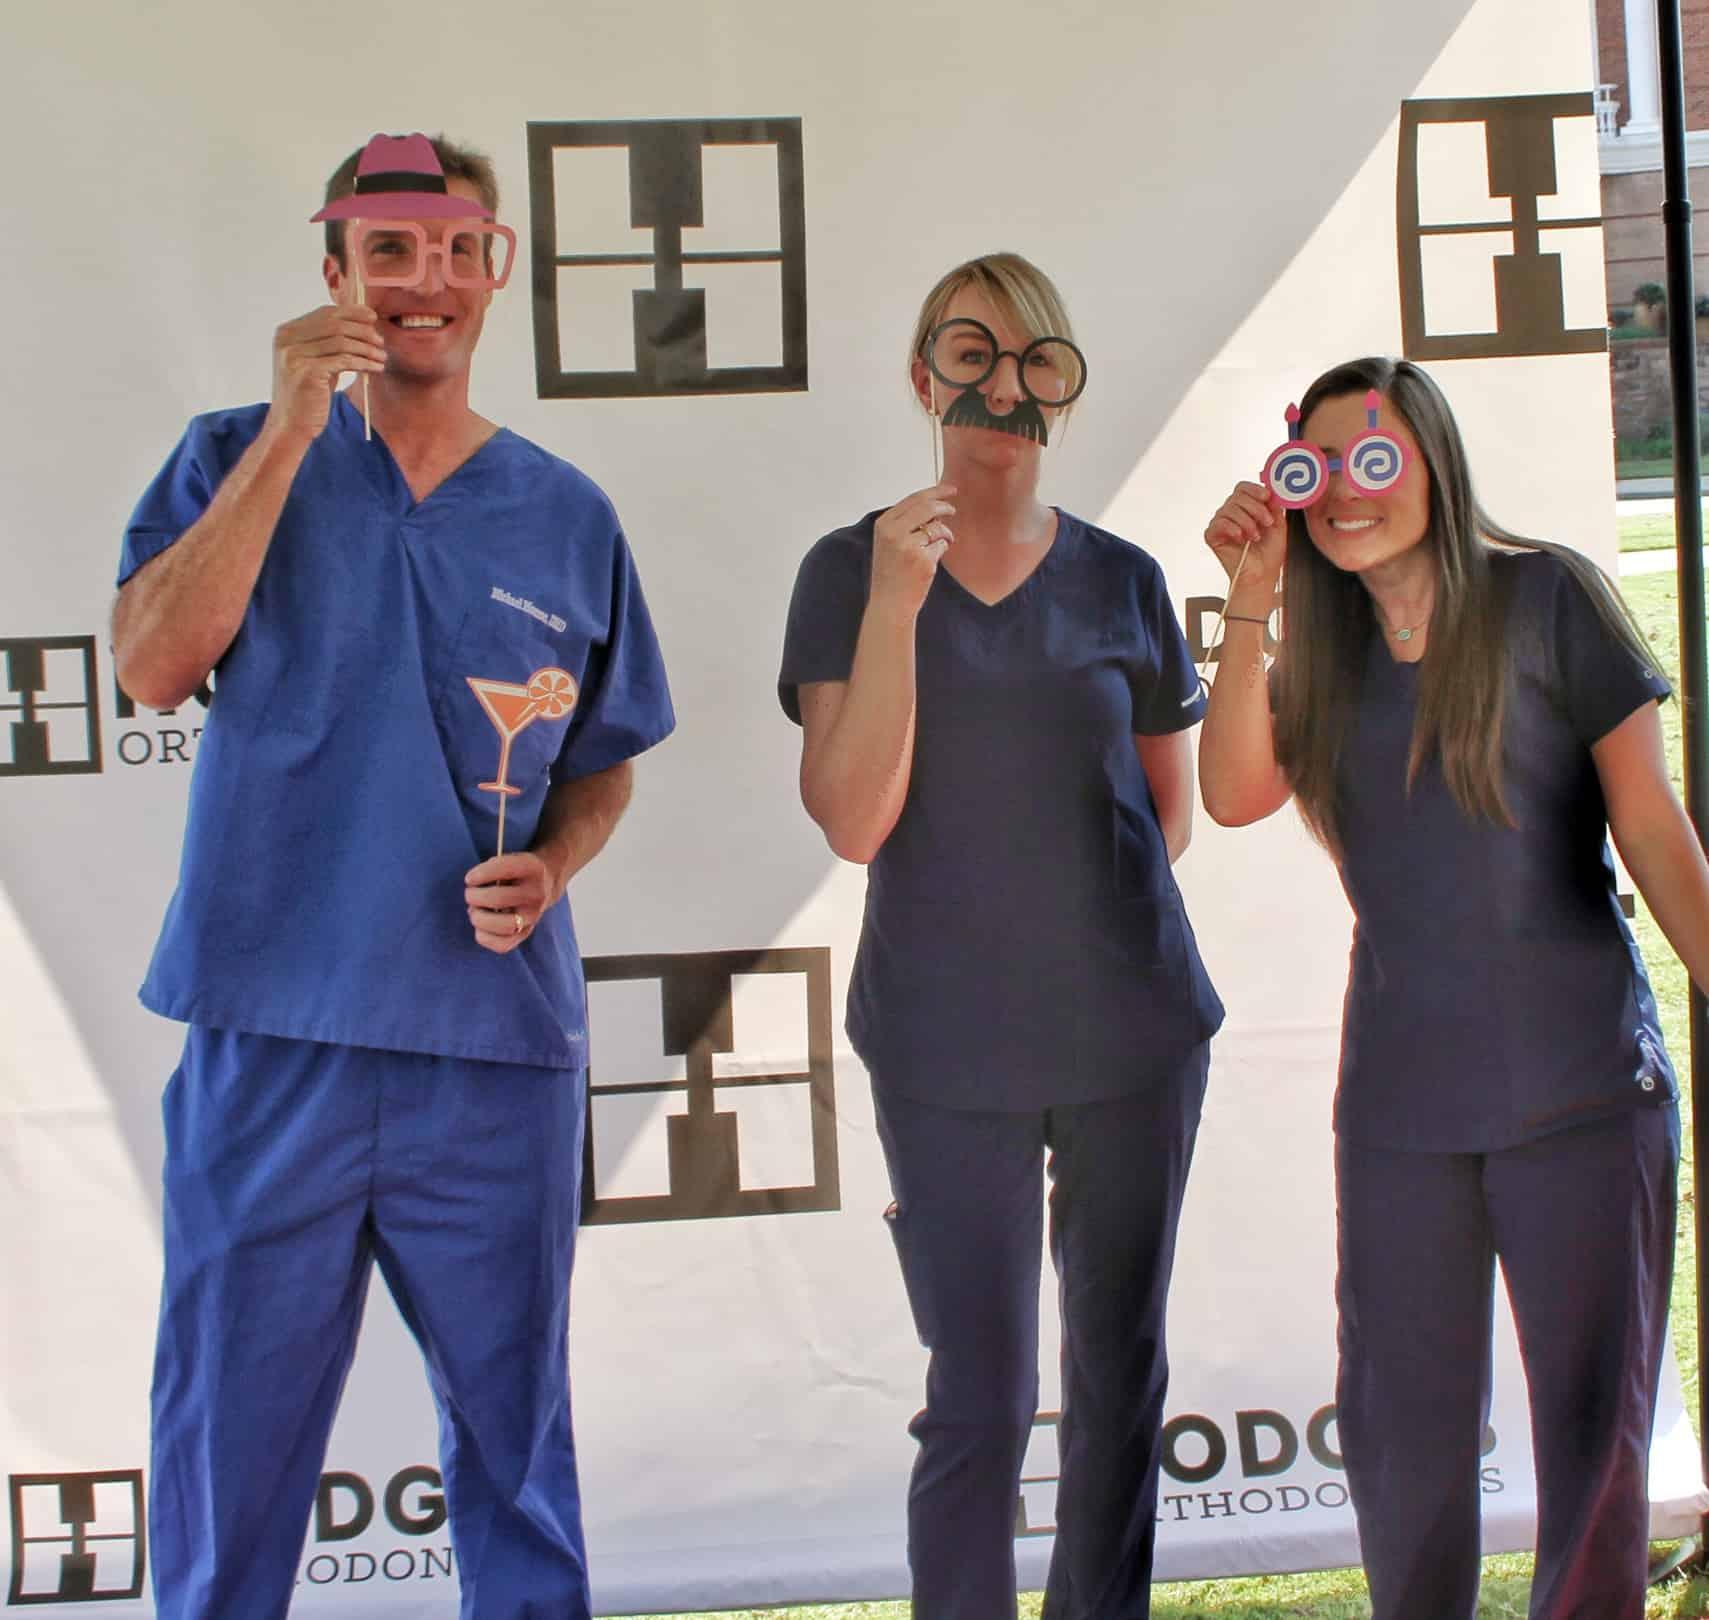 B24DBE6D-F86D-43DA-8918-AFEAF60776F7 2019 Hodges Orthodontics BBQ